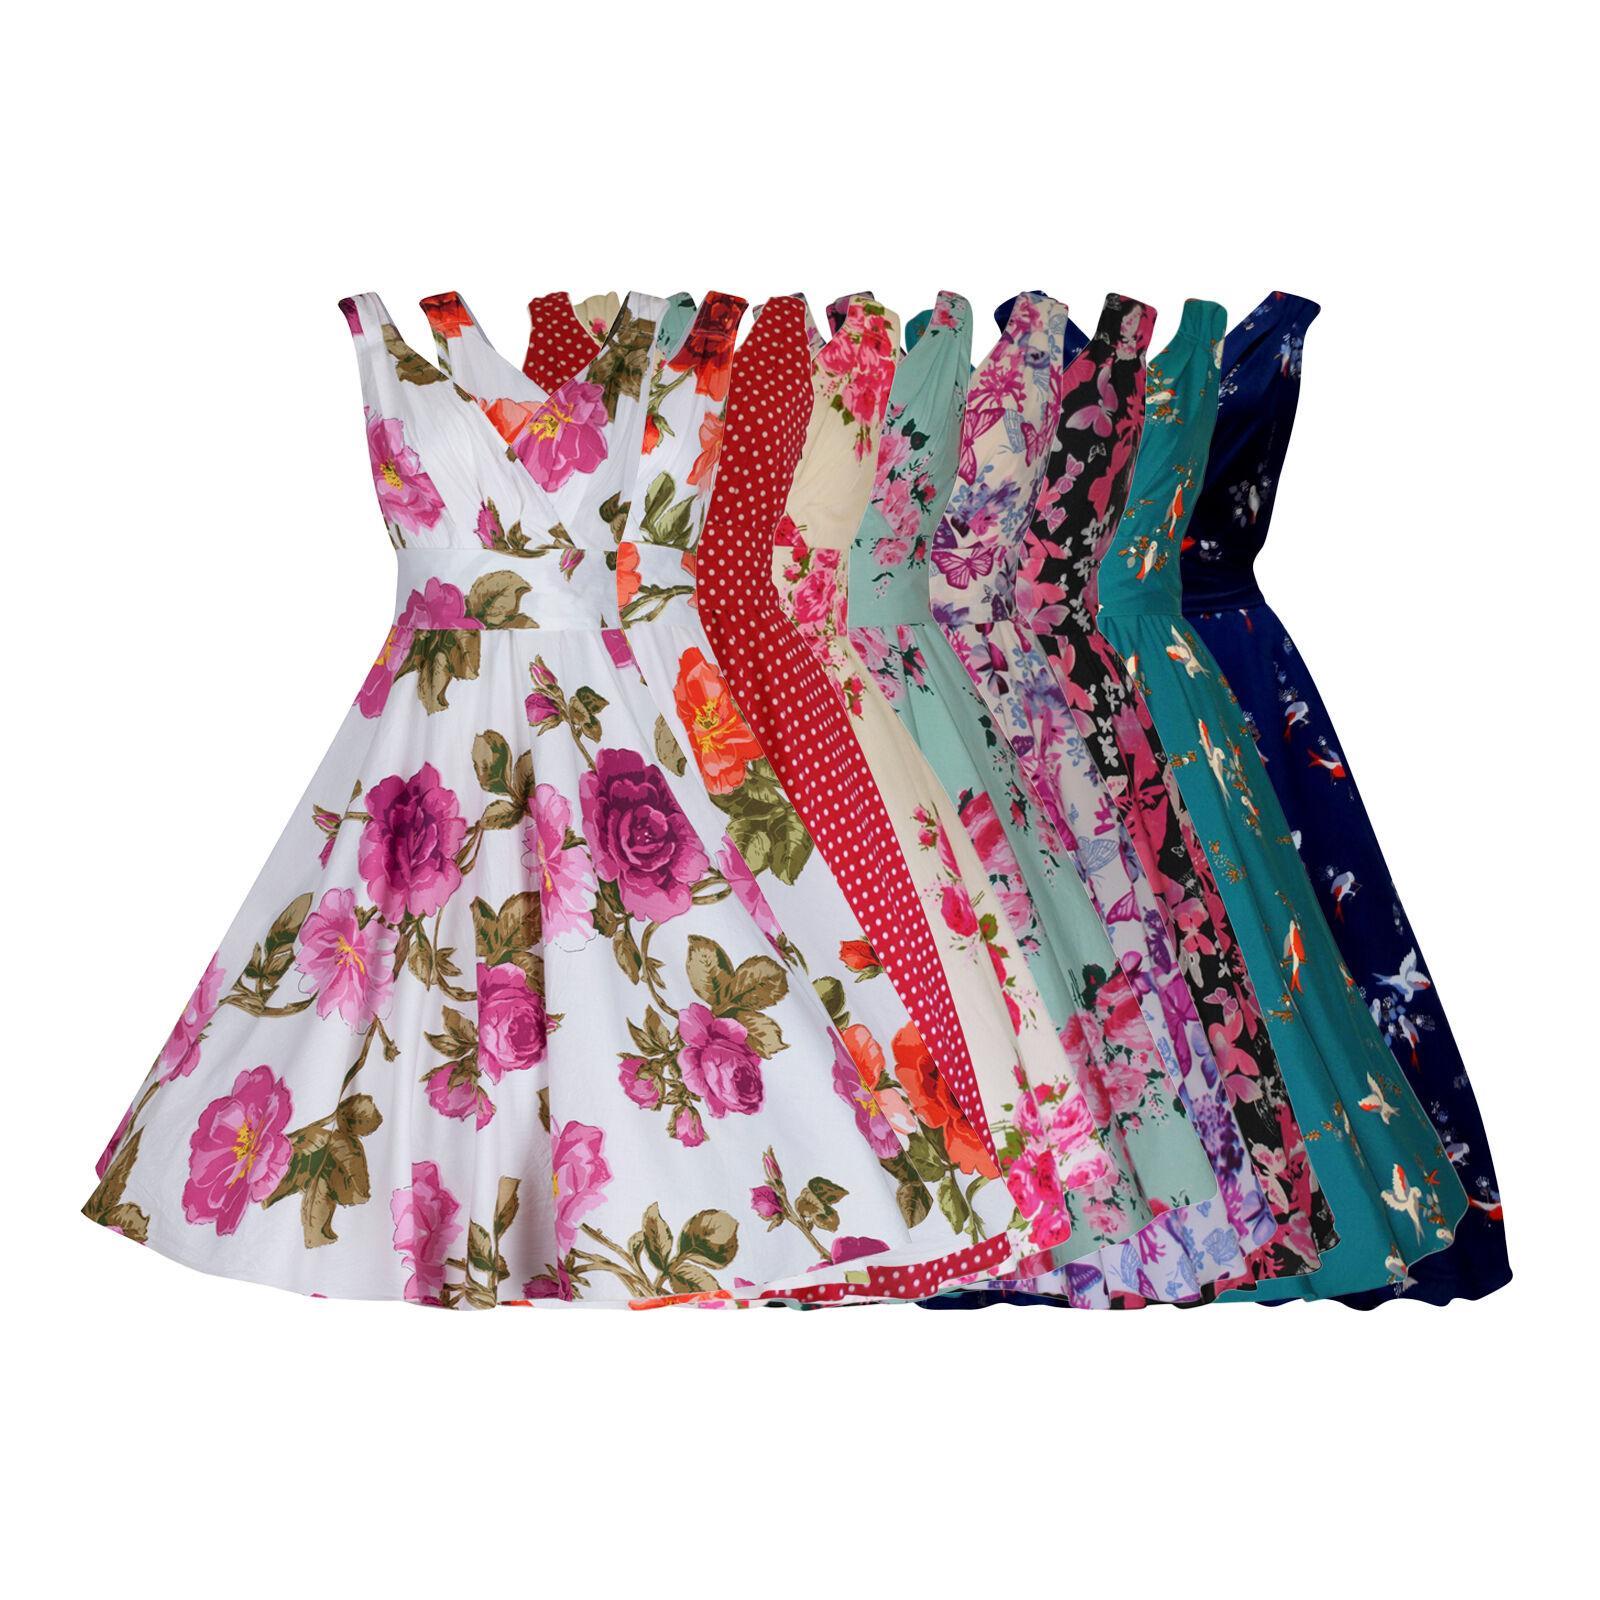 WOMENS 40's 50's RETRO VINTAGE FLARED ROCKABILLY TEA DRESS MANY PRINTS NEW 8-28